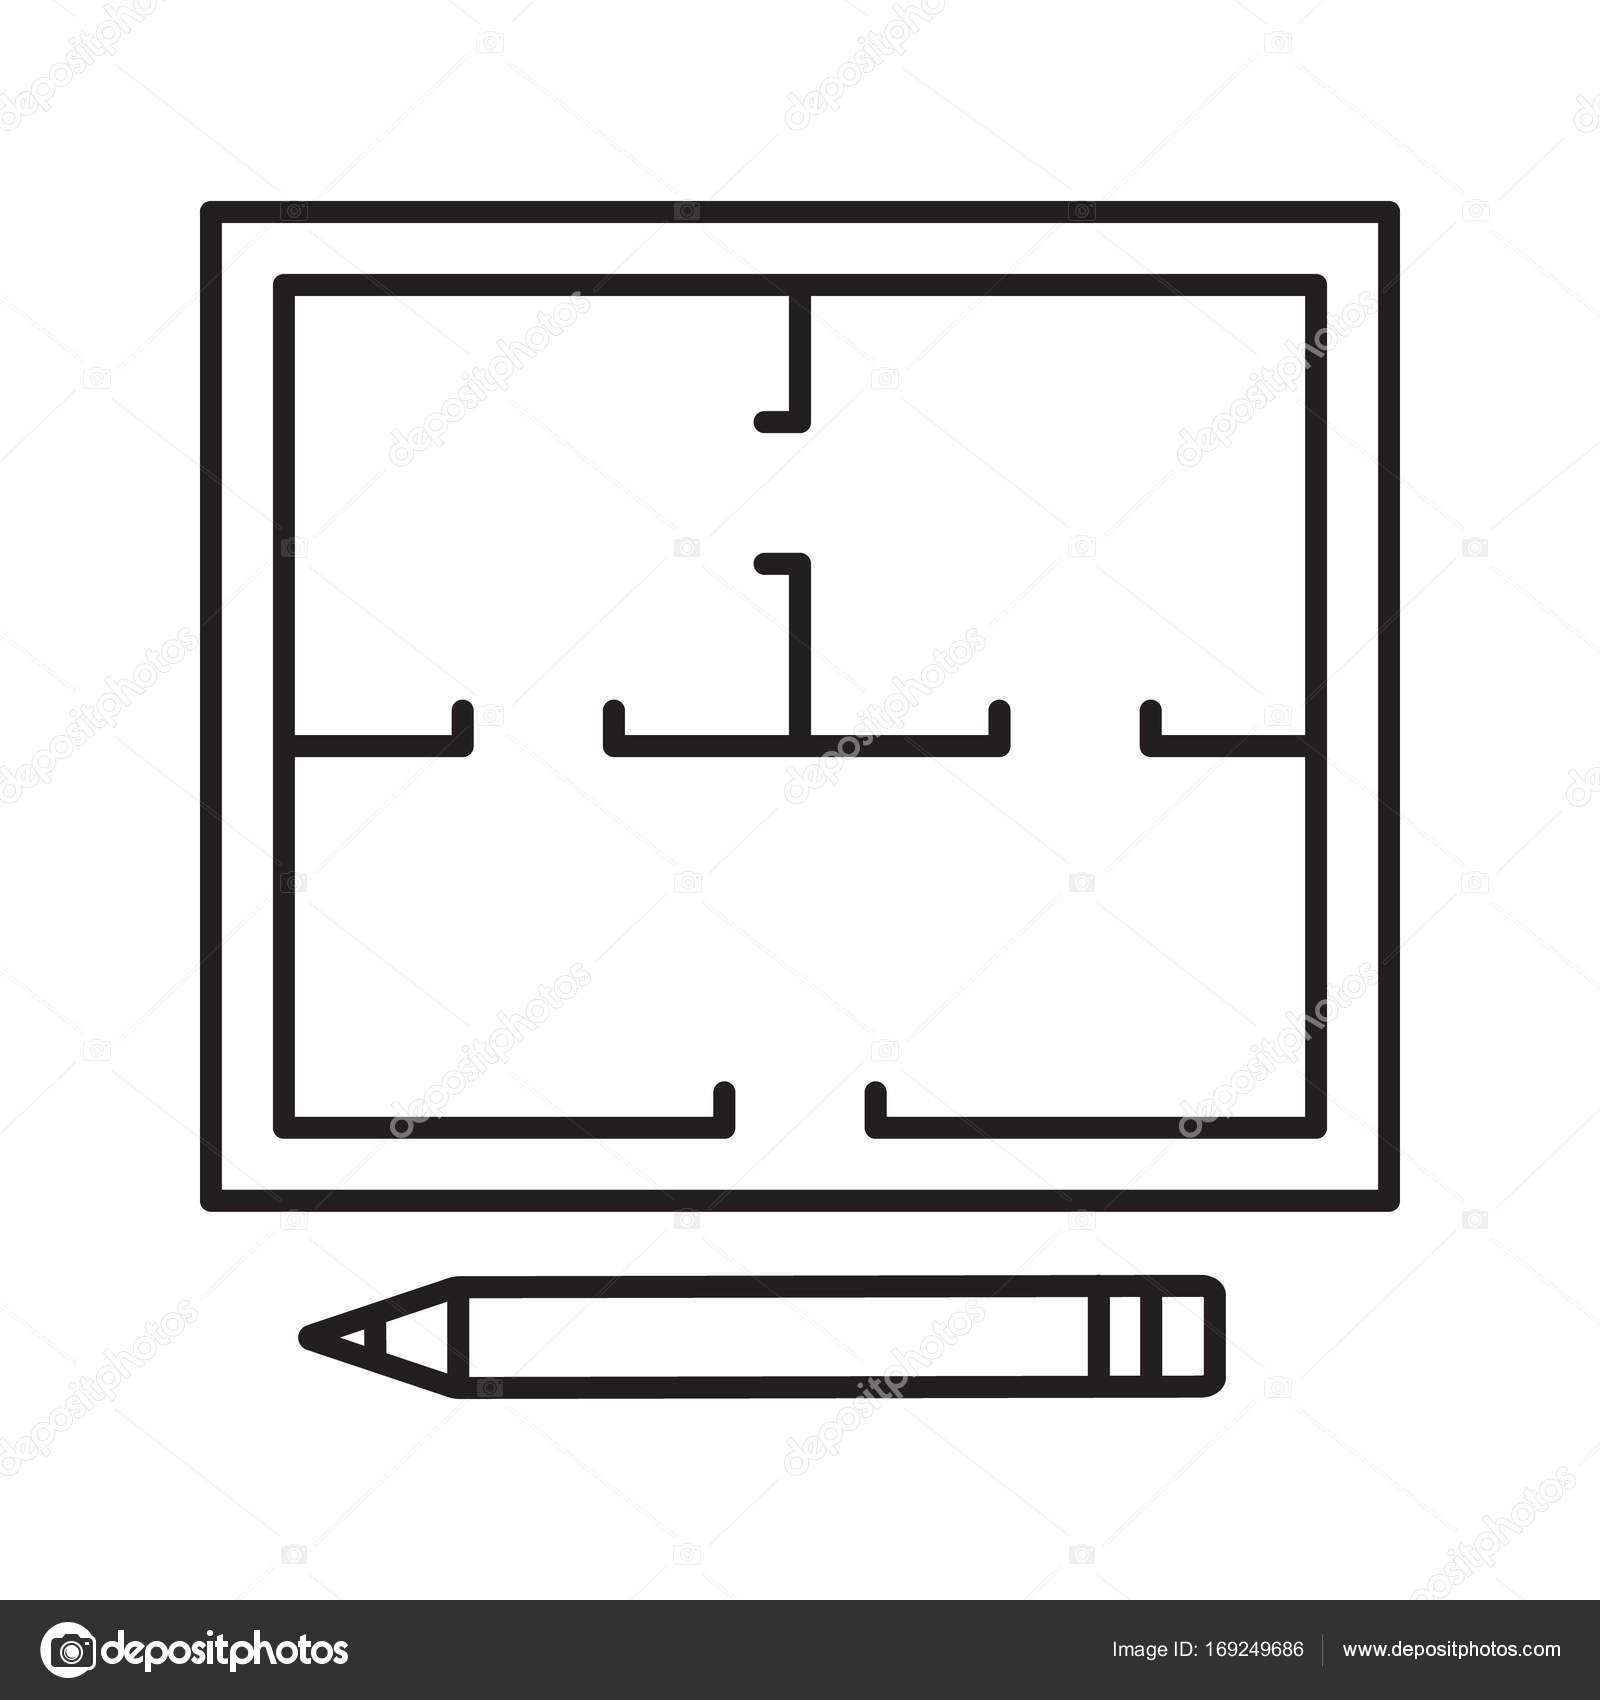 grundriss linear symbol stockvektor bsd 169249686. Black Bedroom Furniture Sets. Home Design Ideas